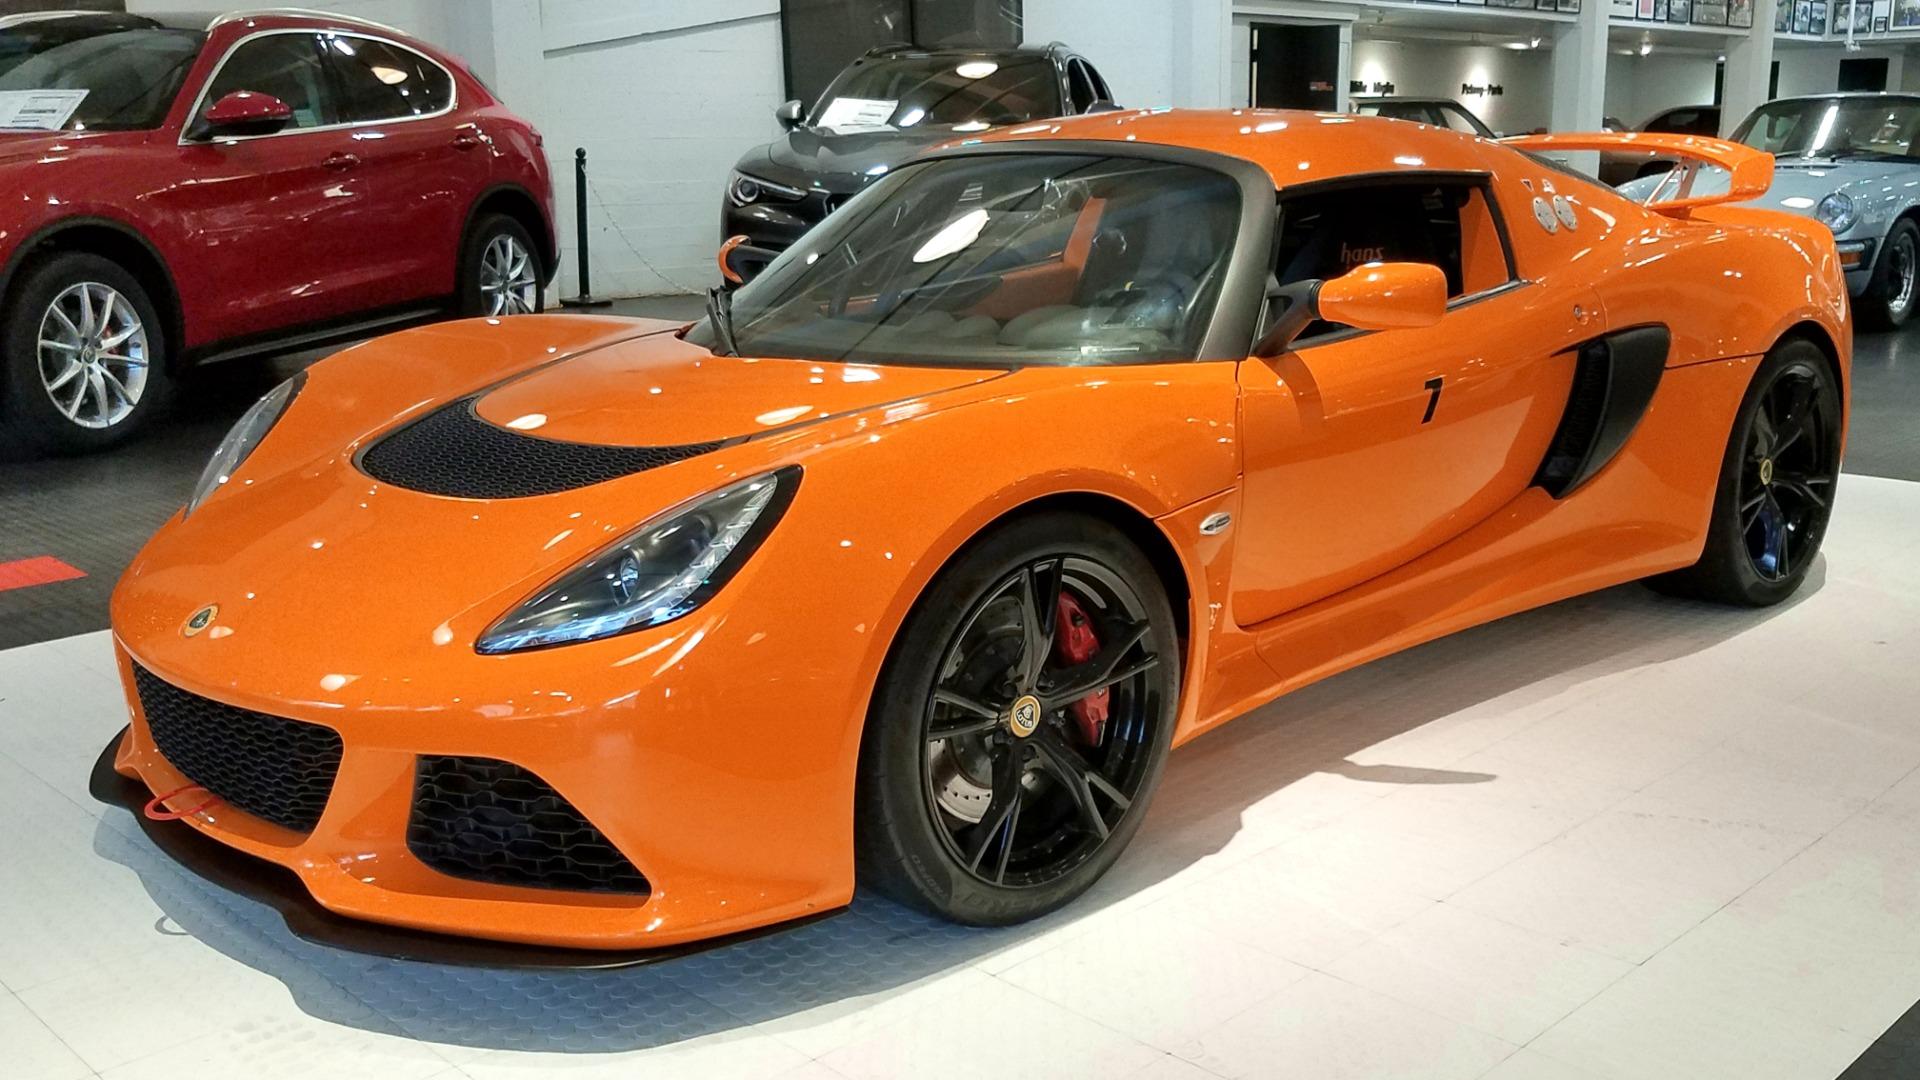 Lotus V6 Cup Price